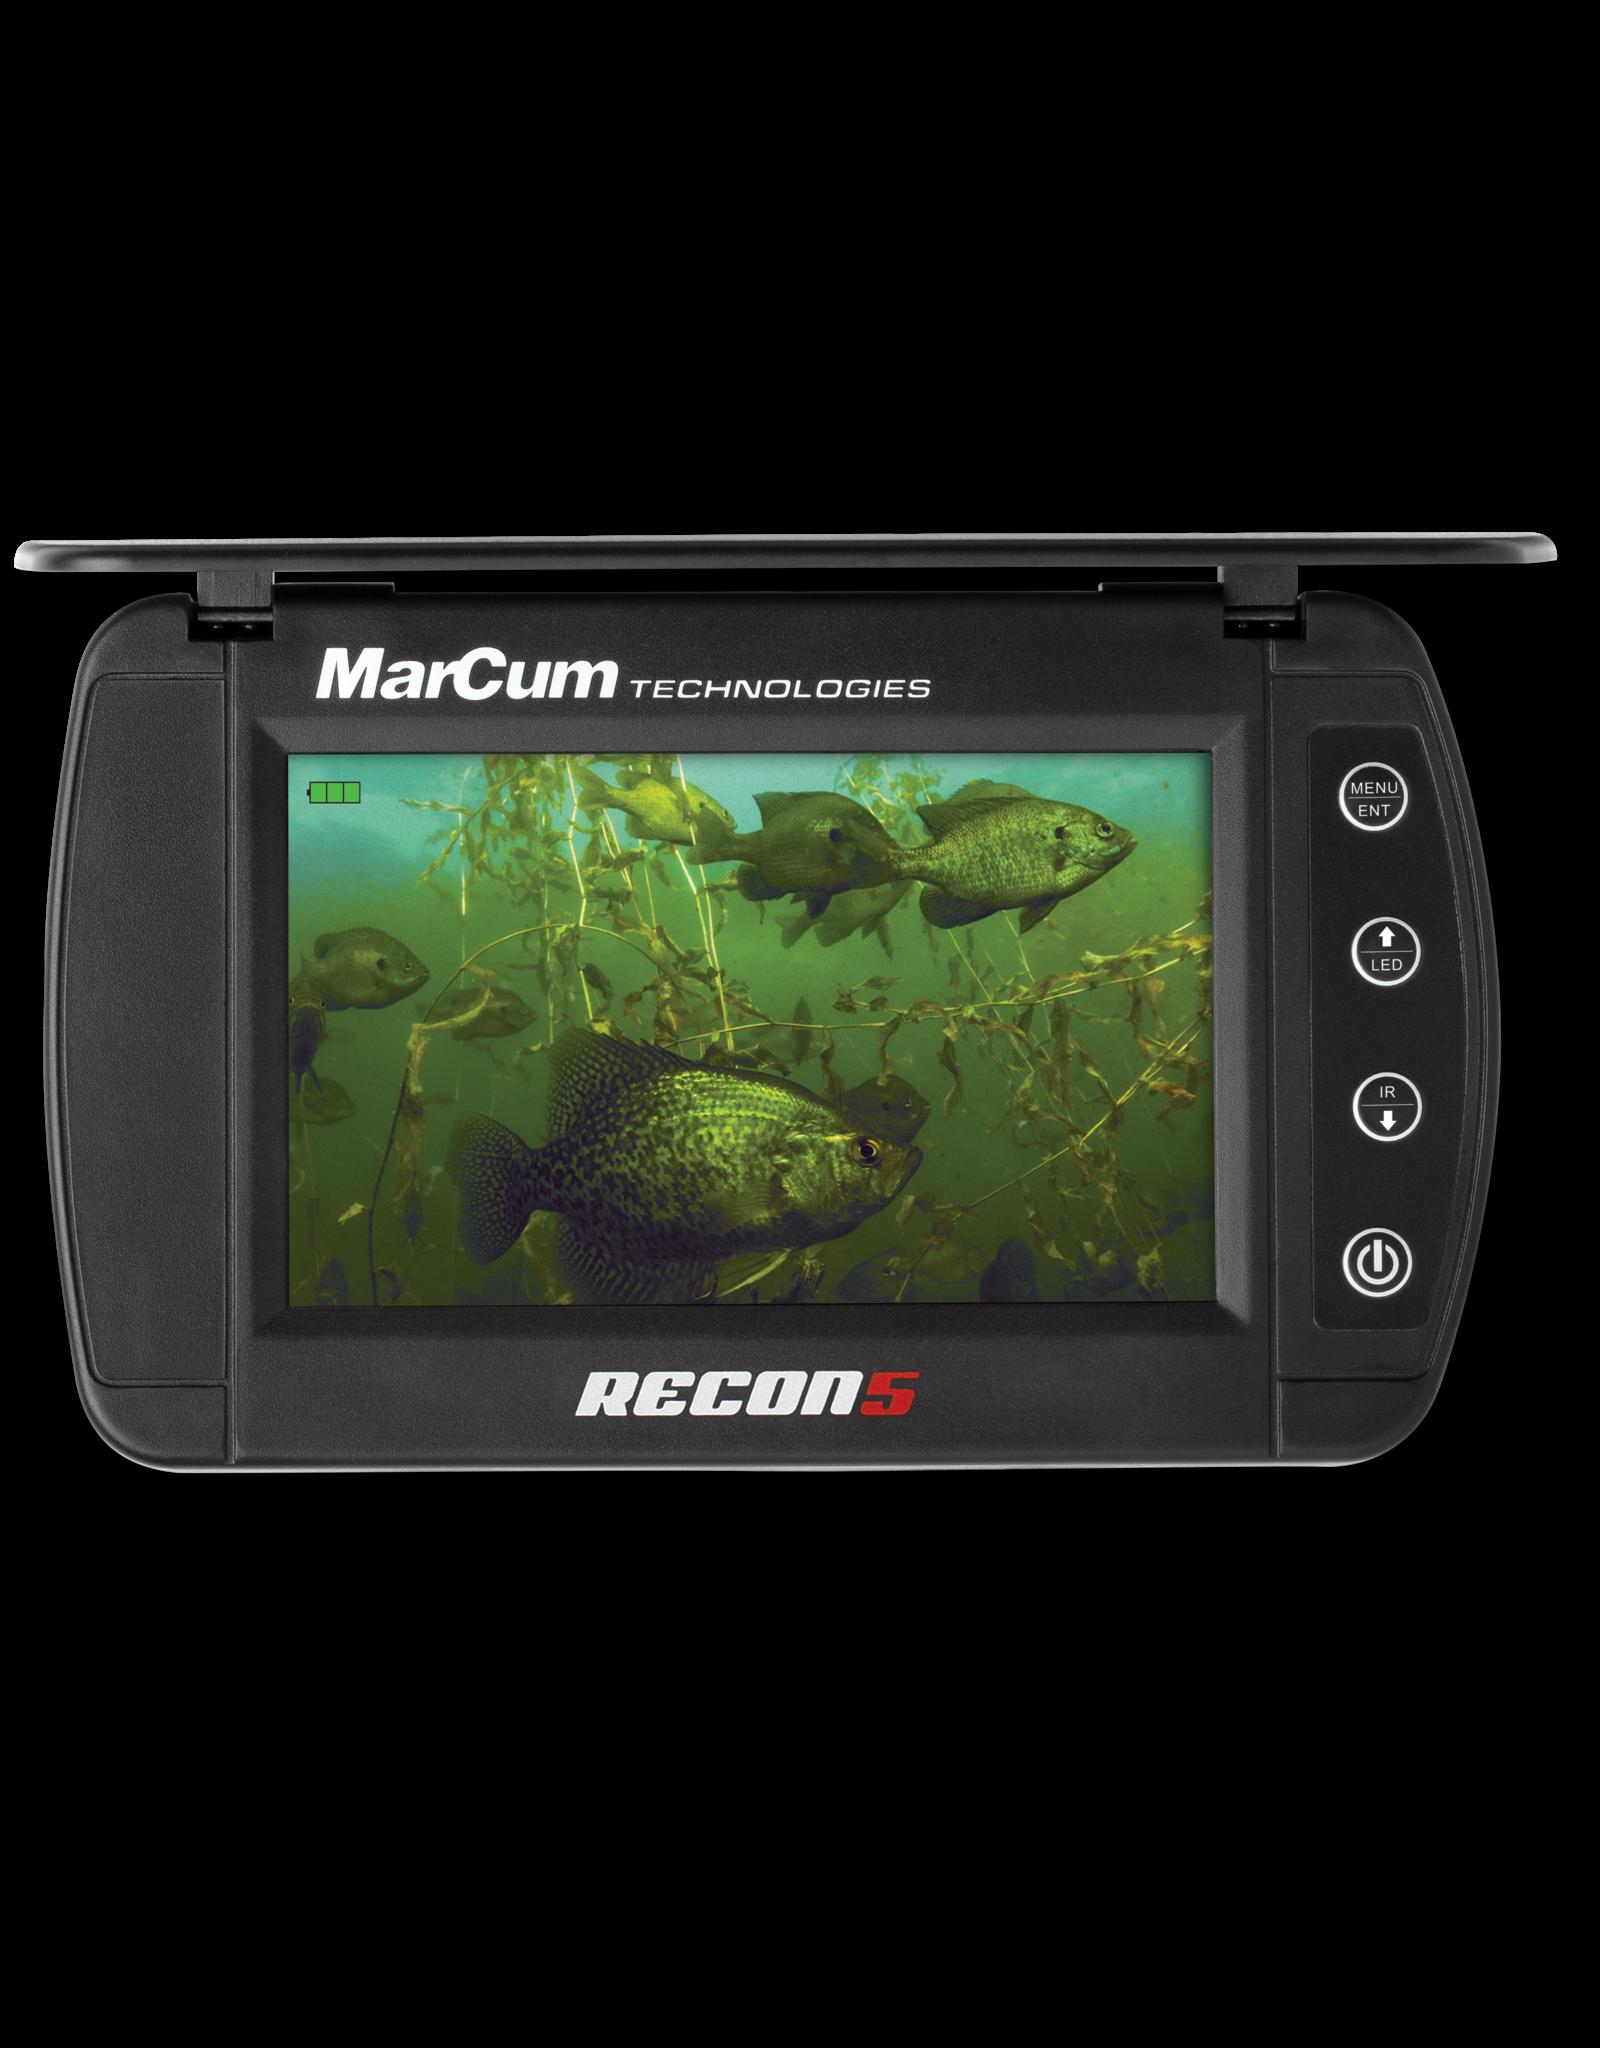 MarCum Technologies MARCUM RECON 5 UNDERWATER VIEWING SYSTEM